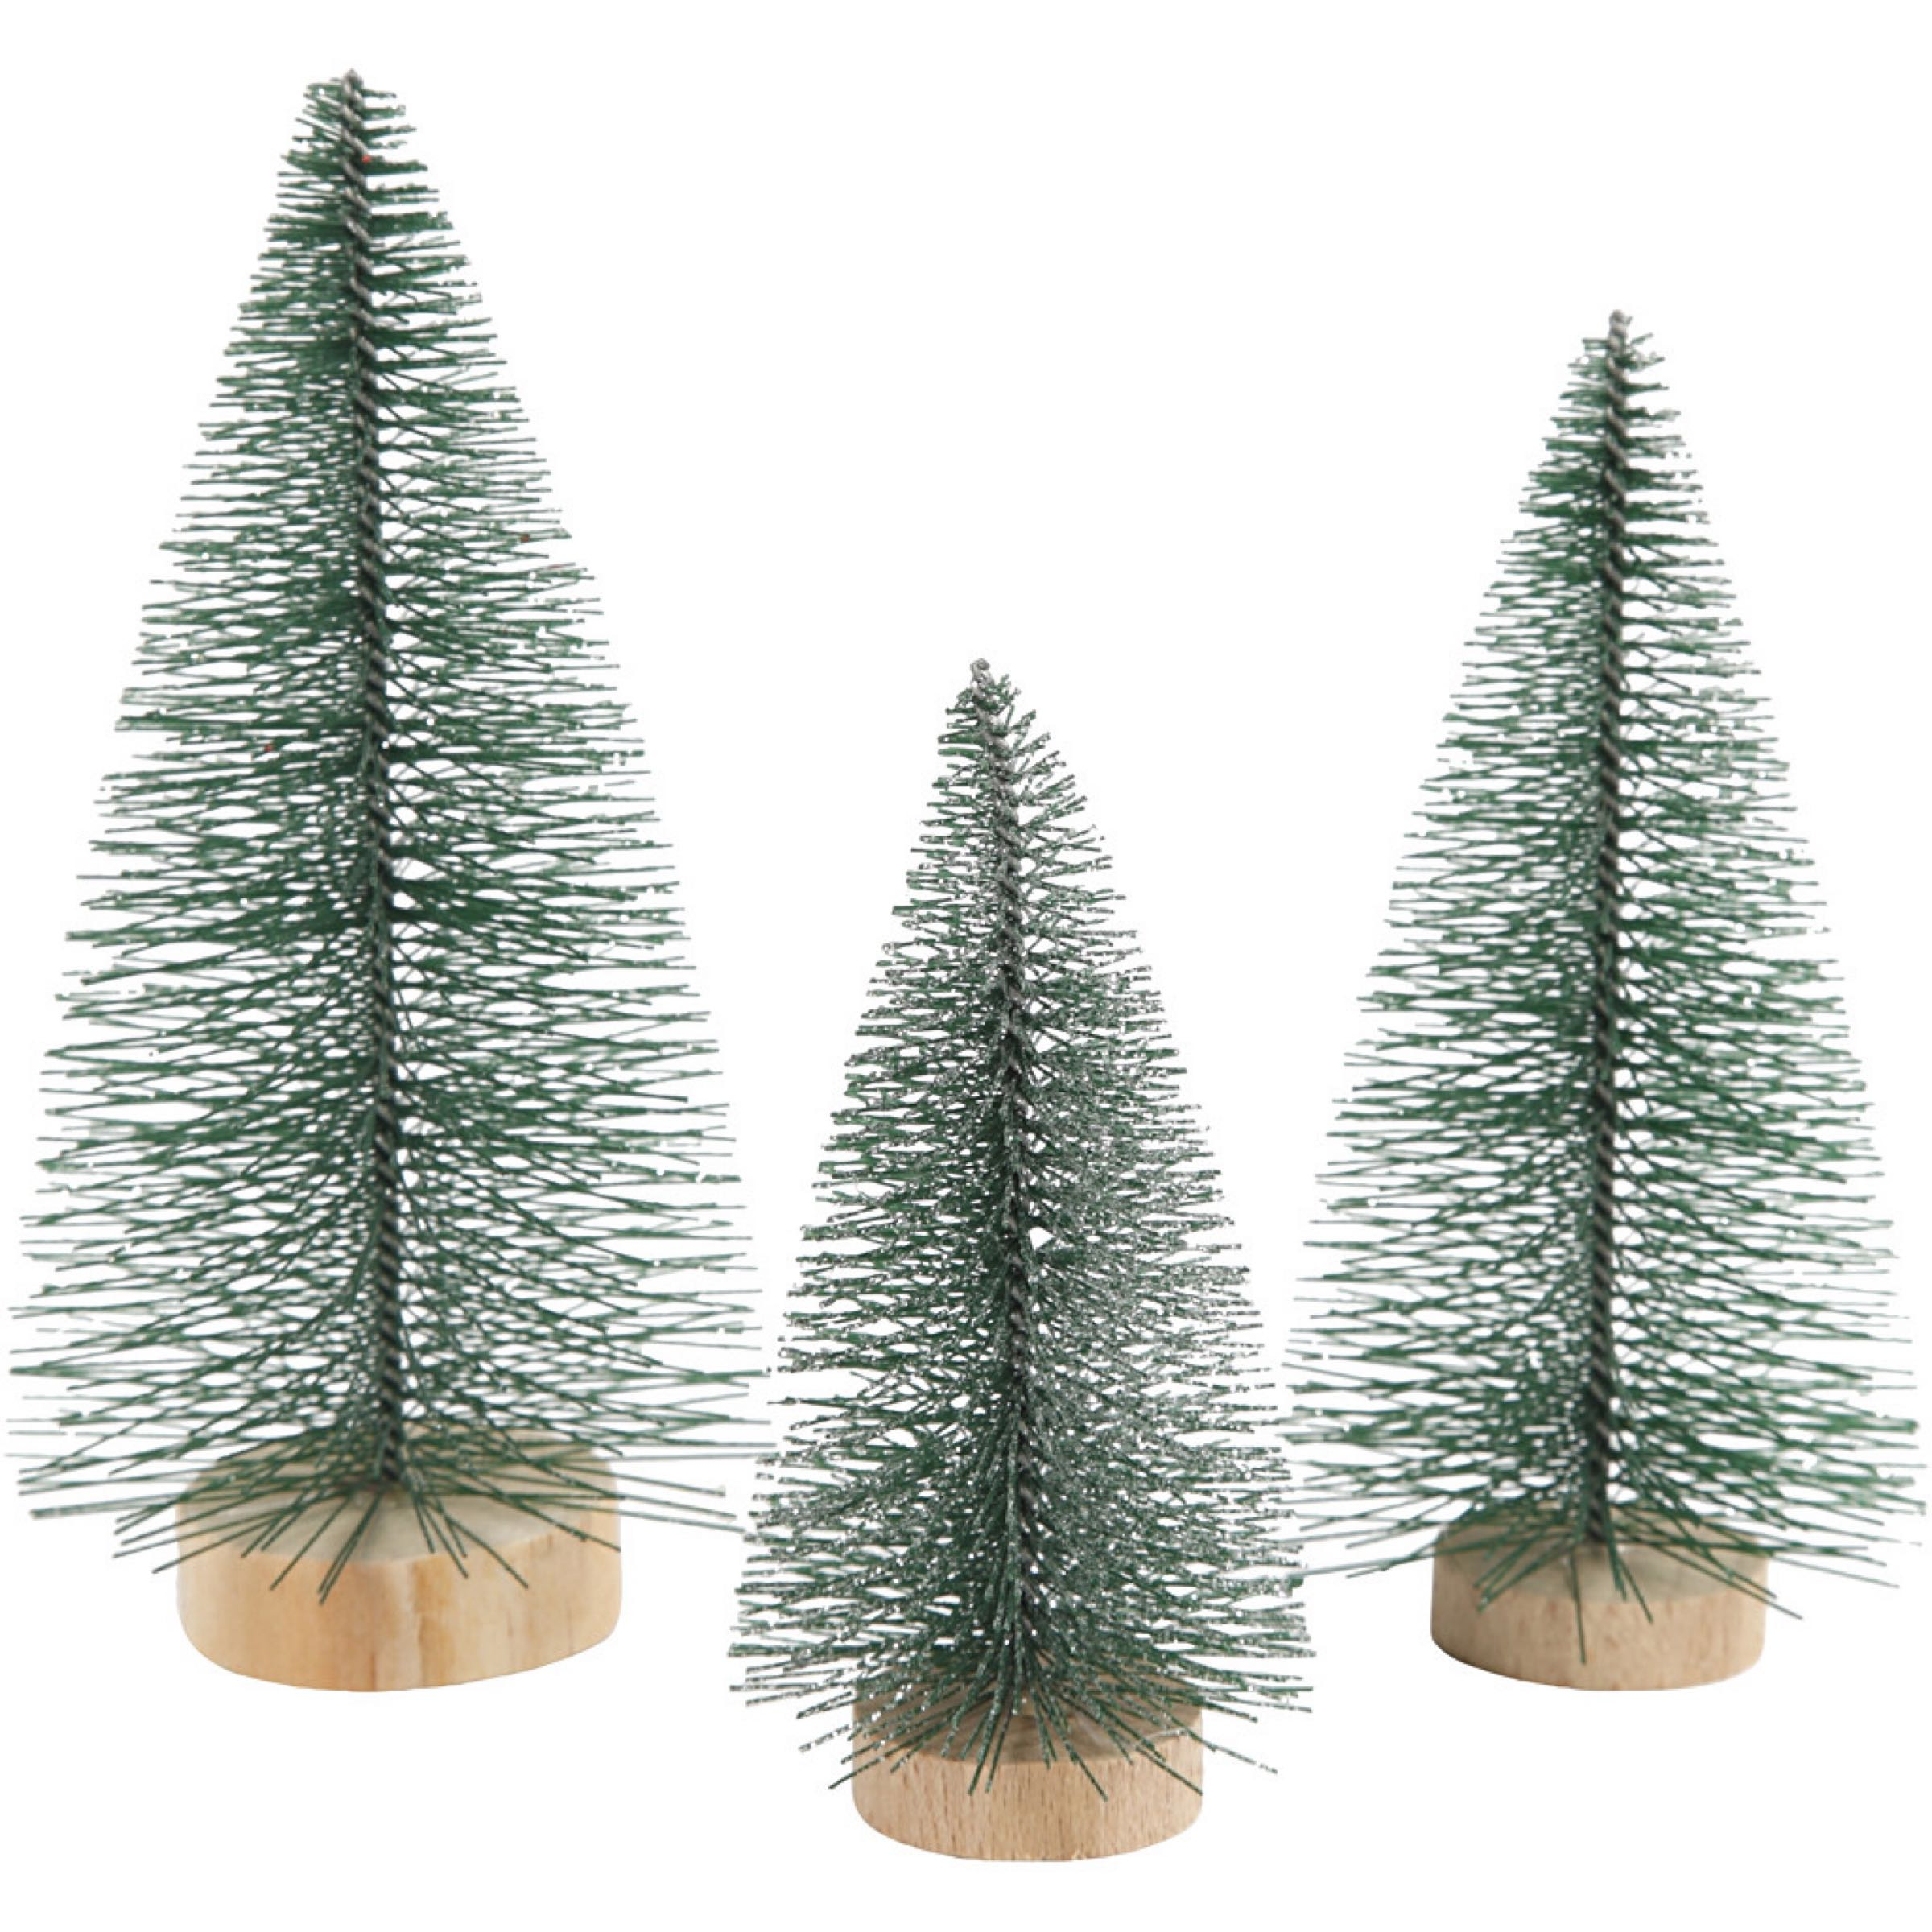 Christmas Spruce Trees, H: 10+13+14 cm, trees, 3pcs